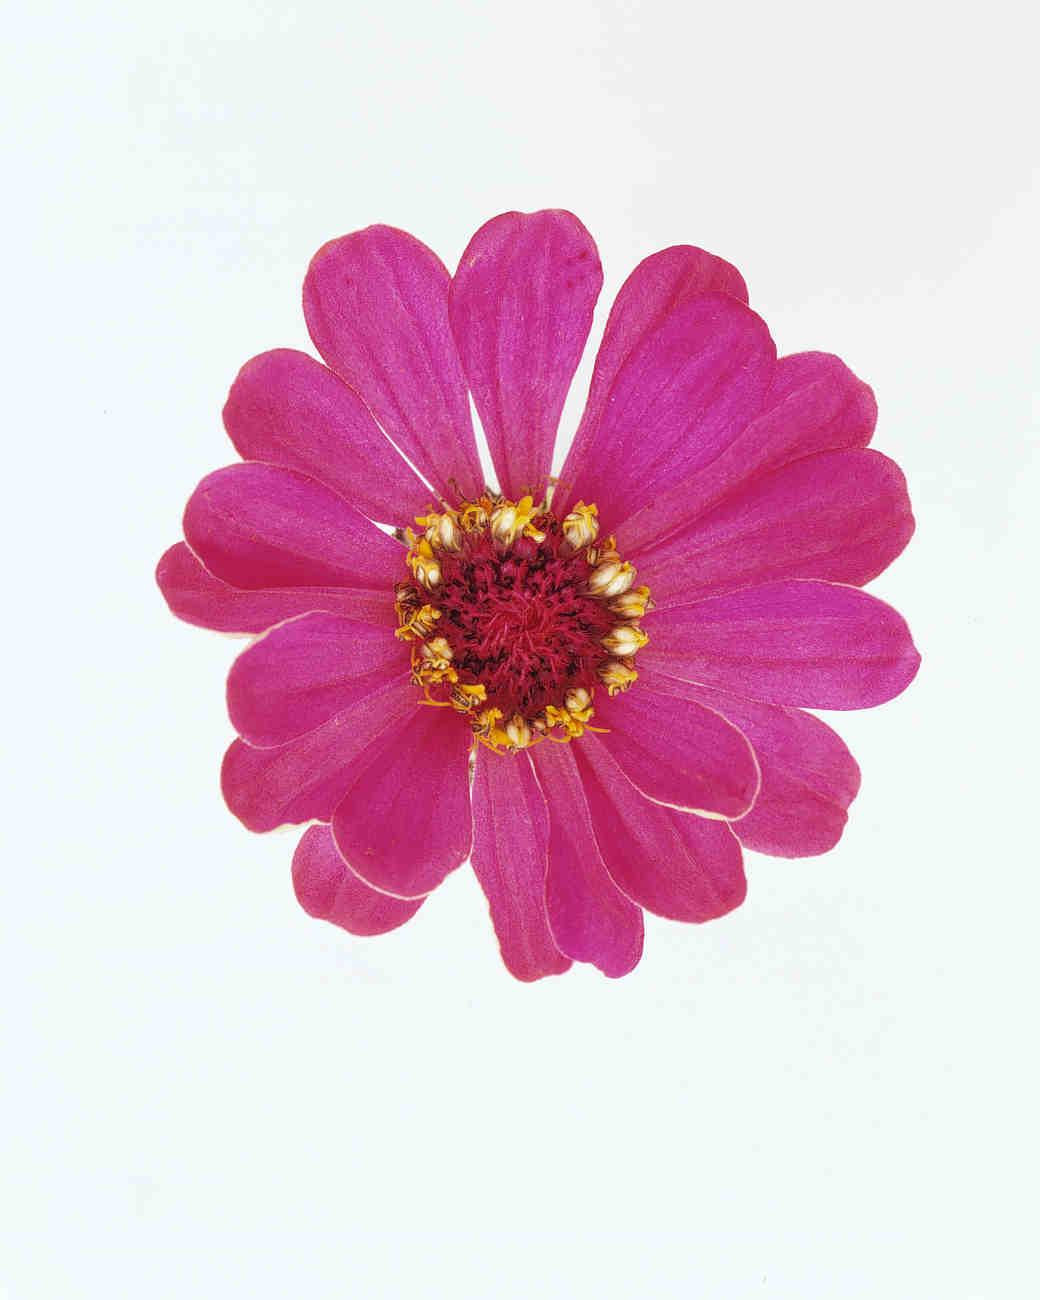 flower-glossary-zinnia-magenta-a98432-0415.jpg